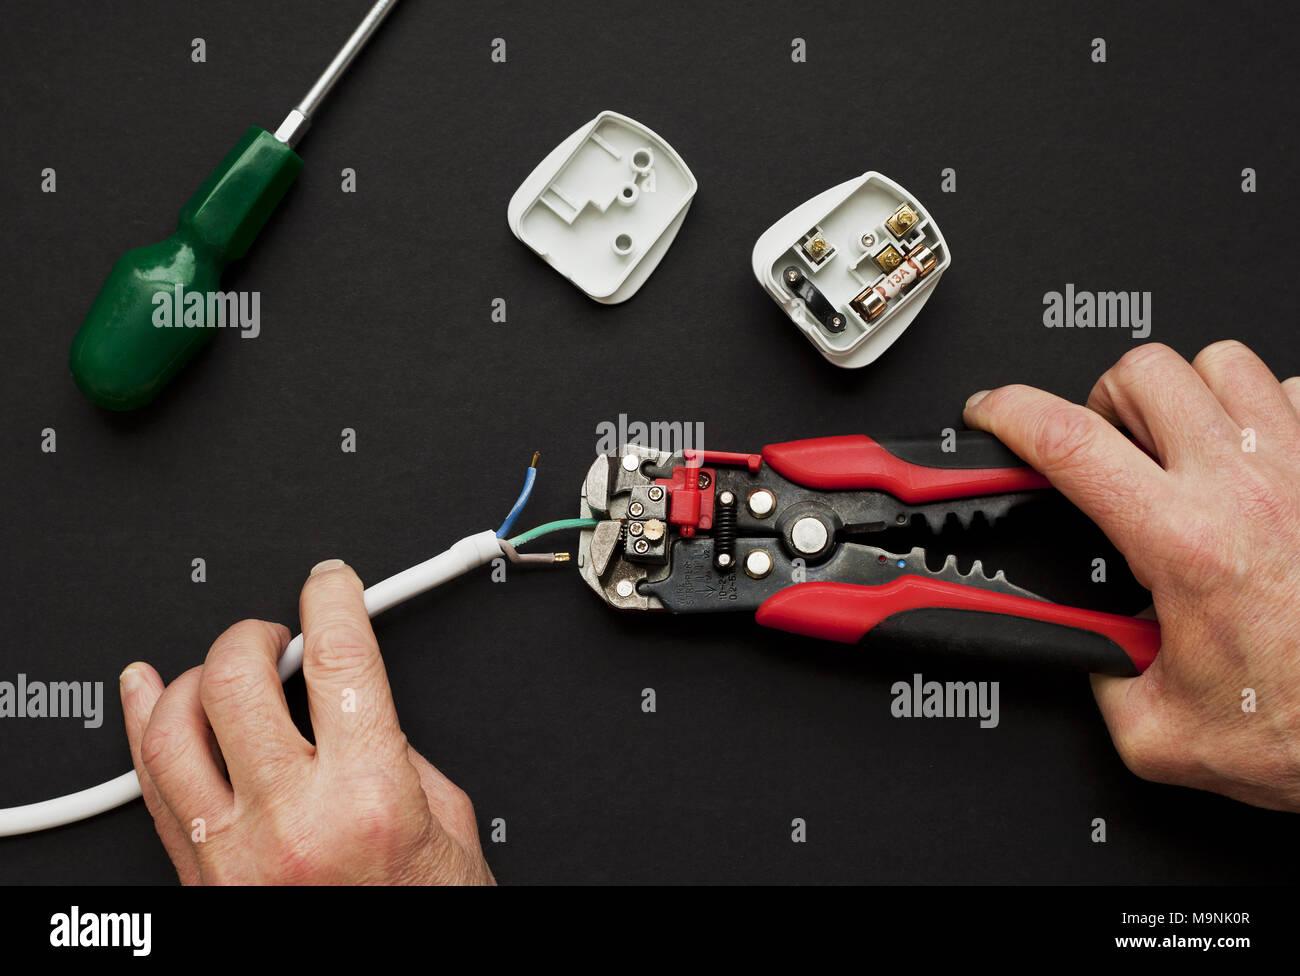 Electrical Hazard Plug Stock Photos & Electrical Hazard Plug Stock ...